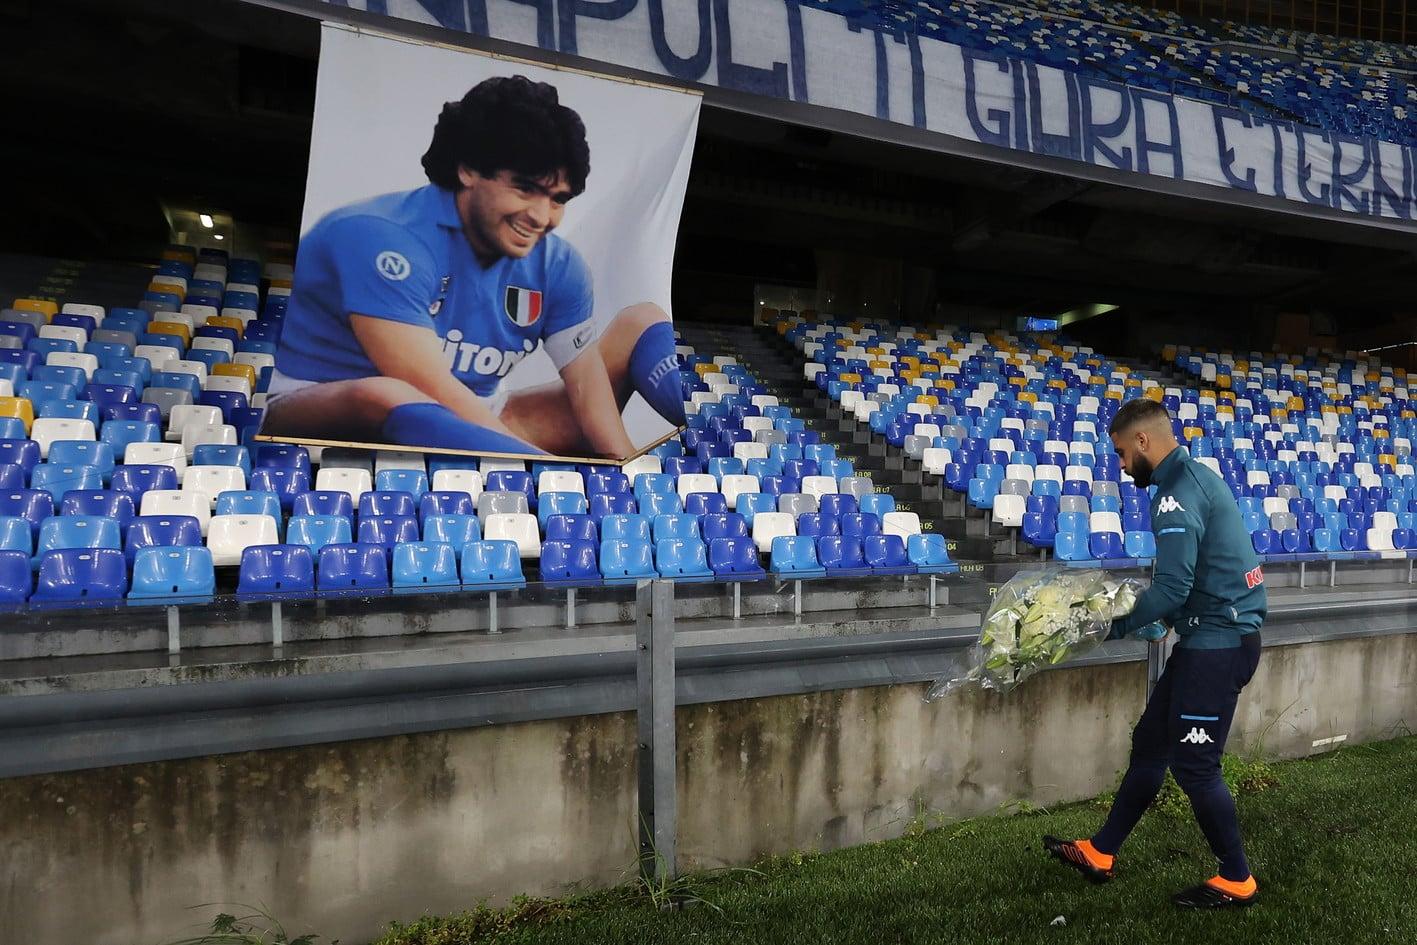 Napoli, al via le procedure per il uovo stadio Diego Armando Maradona